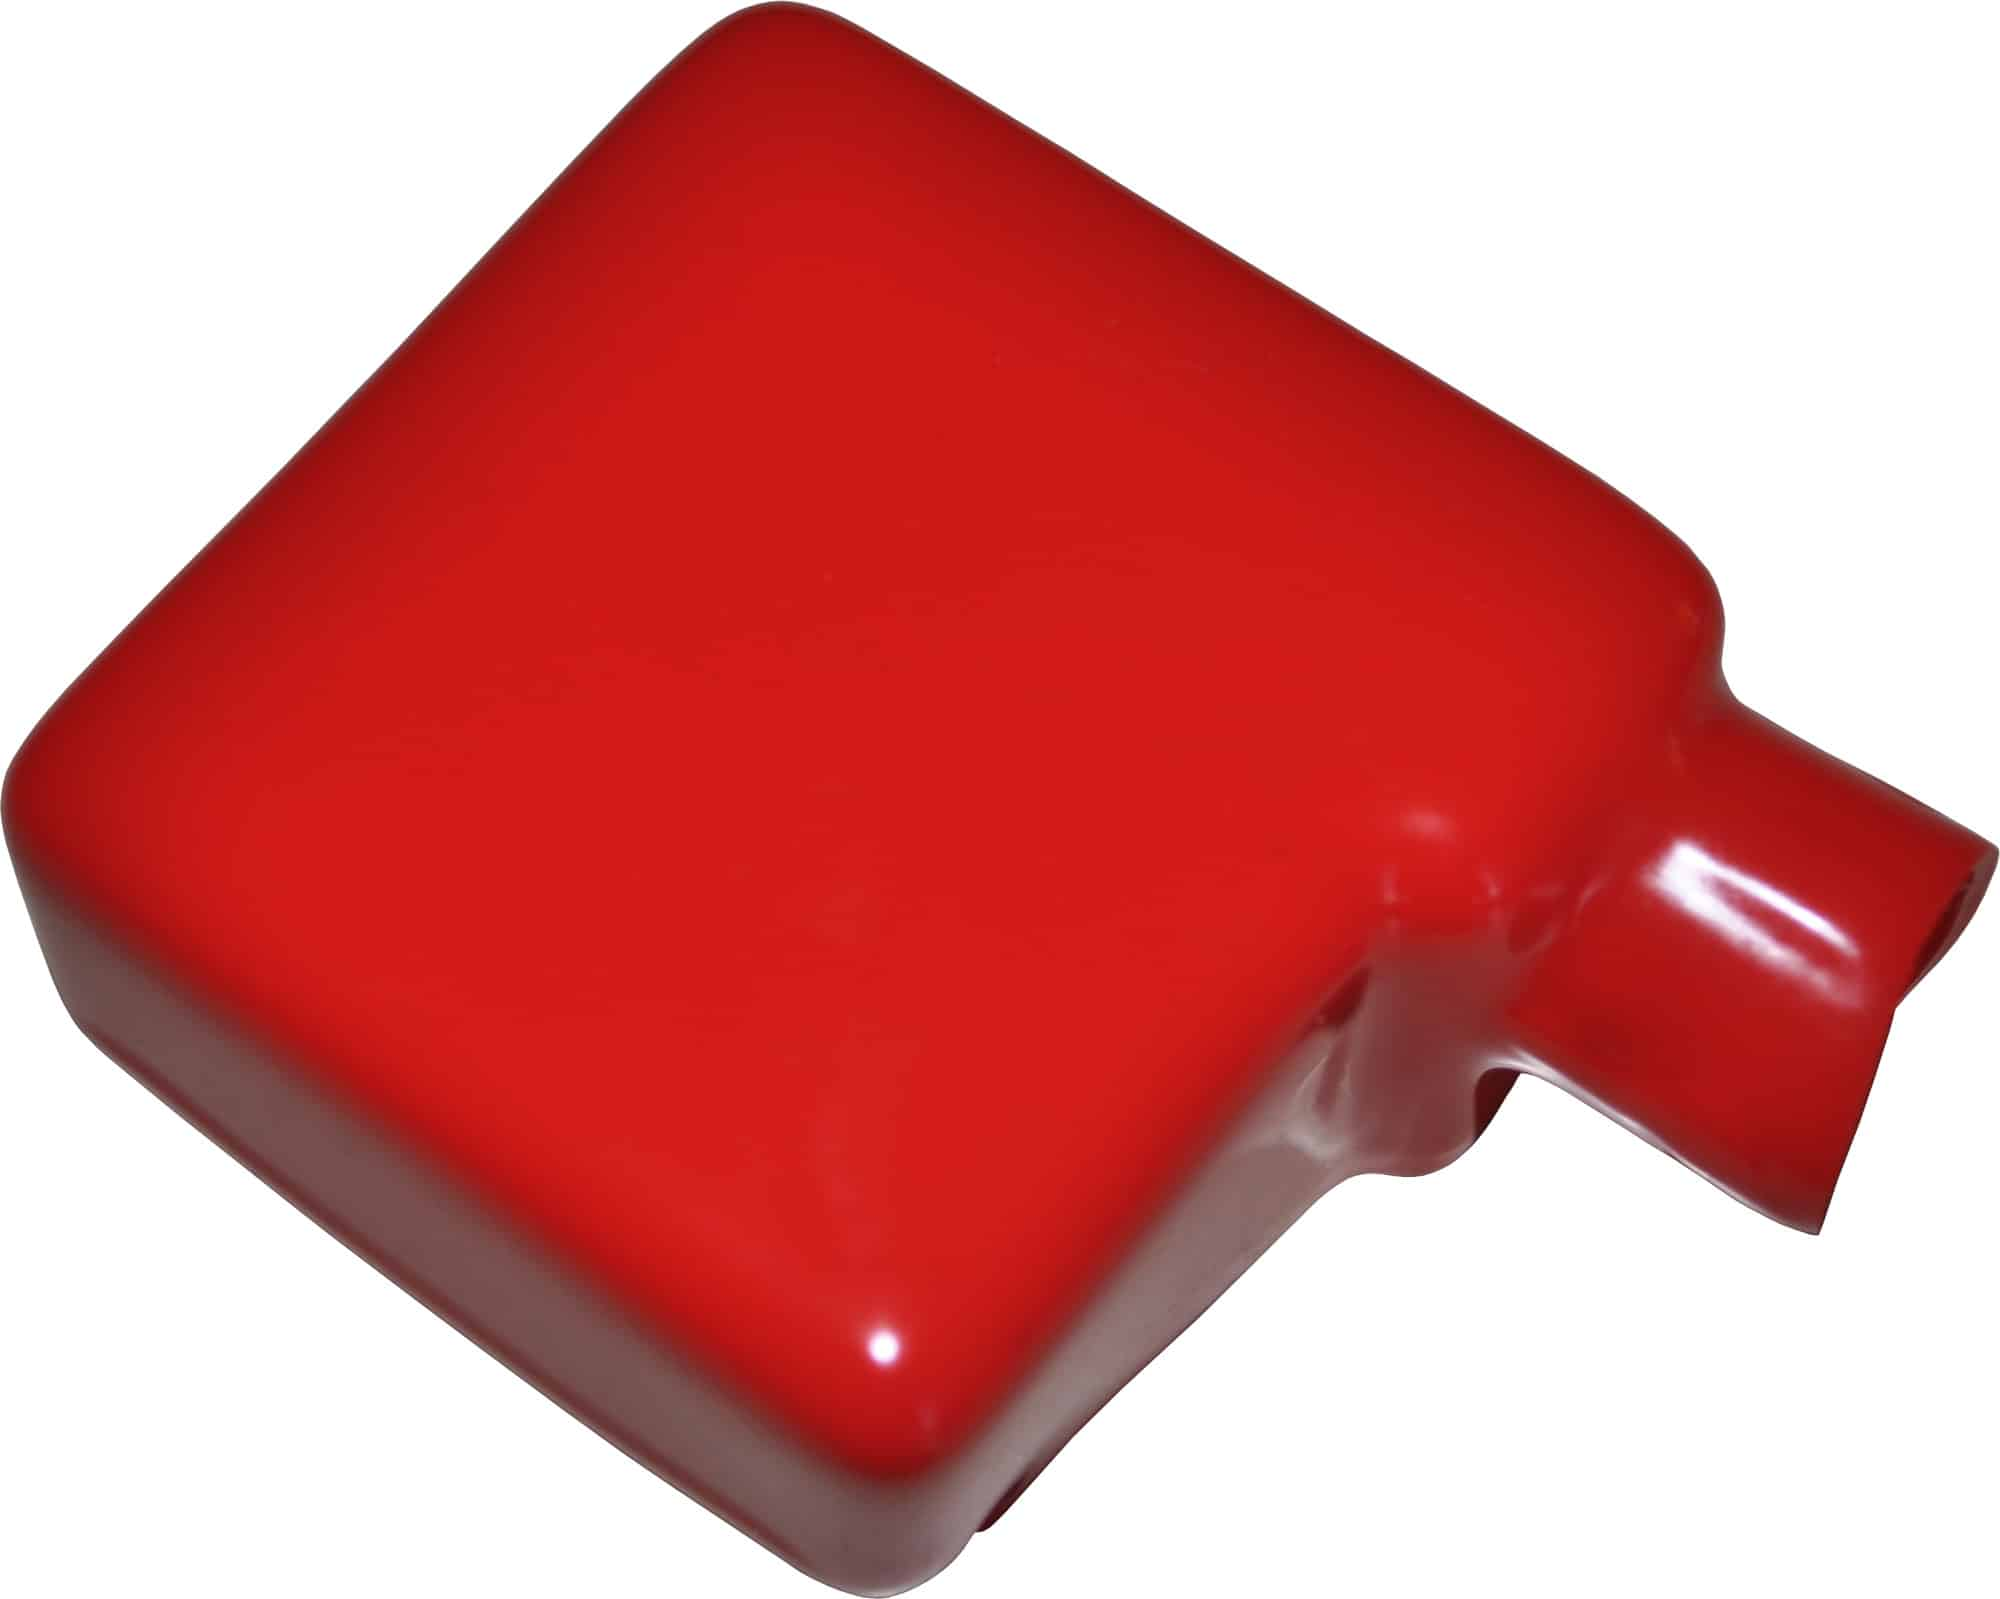 Kappe hætte beskytter til batteri polsko batteripol rød bil lastbil motorcykel scooter traktor camping beskyttelseskappe støvkappe 020296R RACO